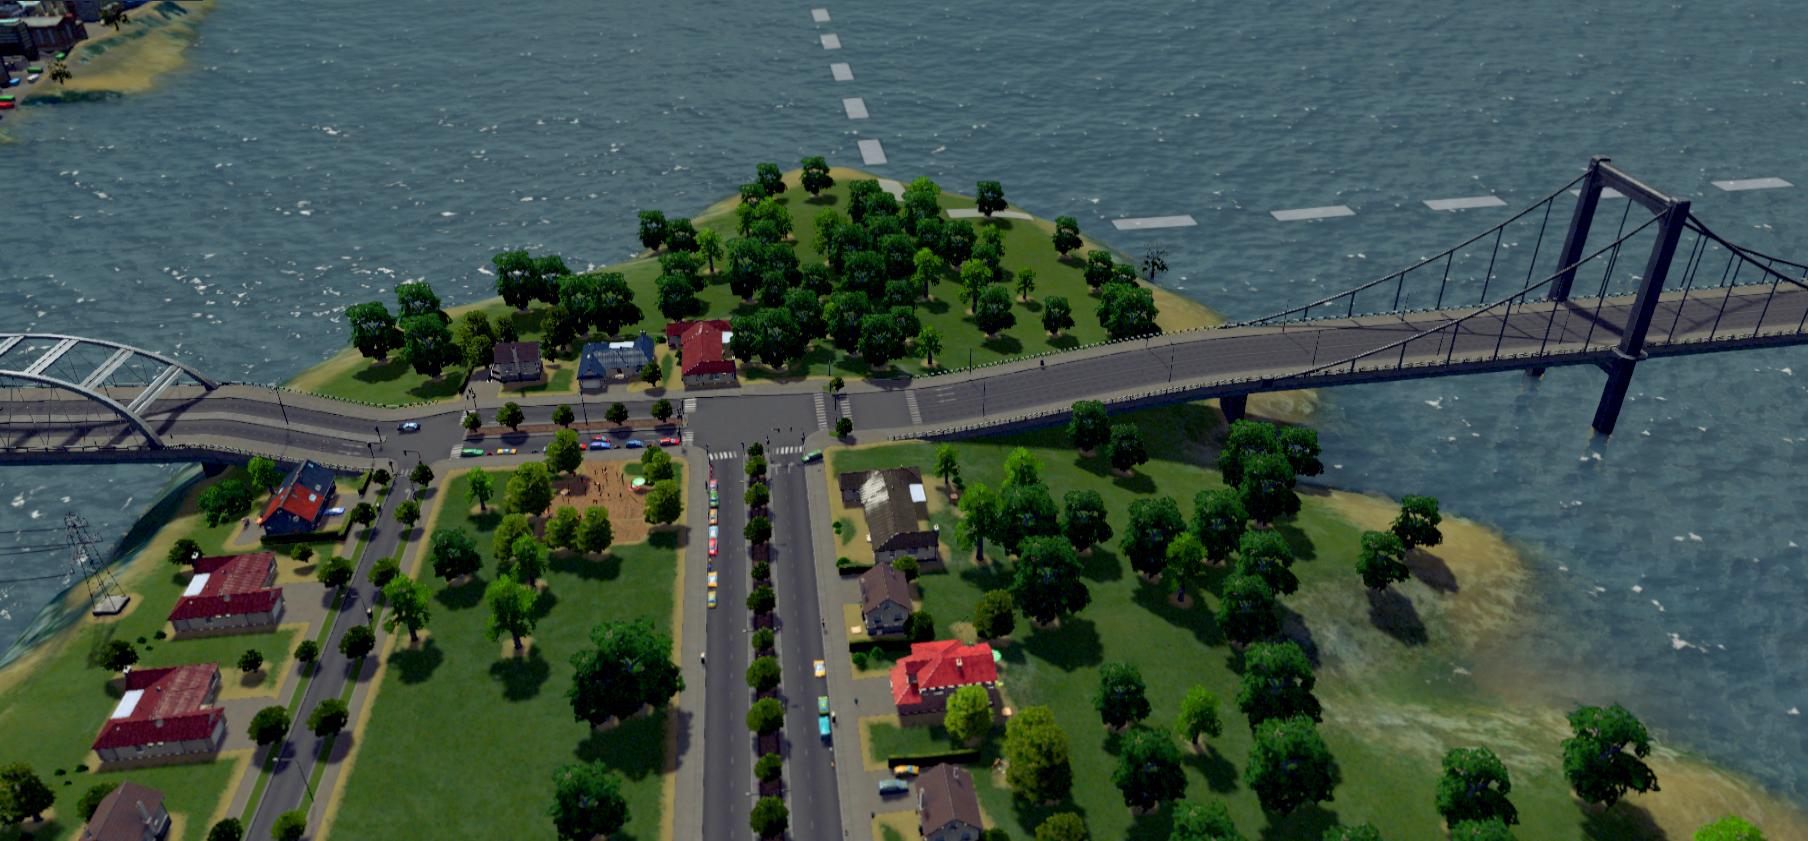 islandbridges.png